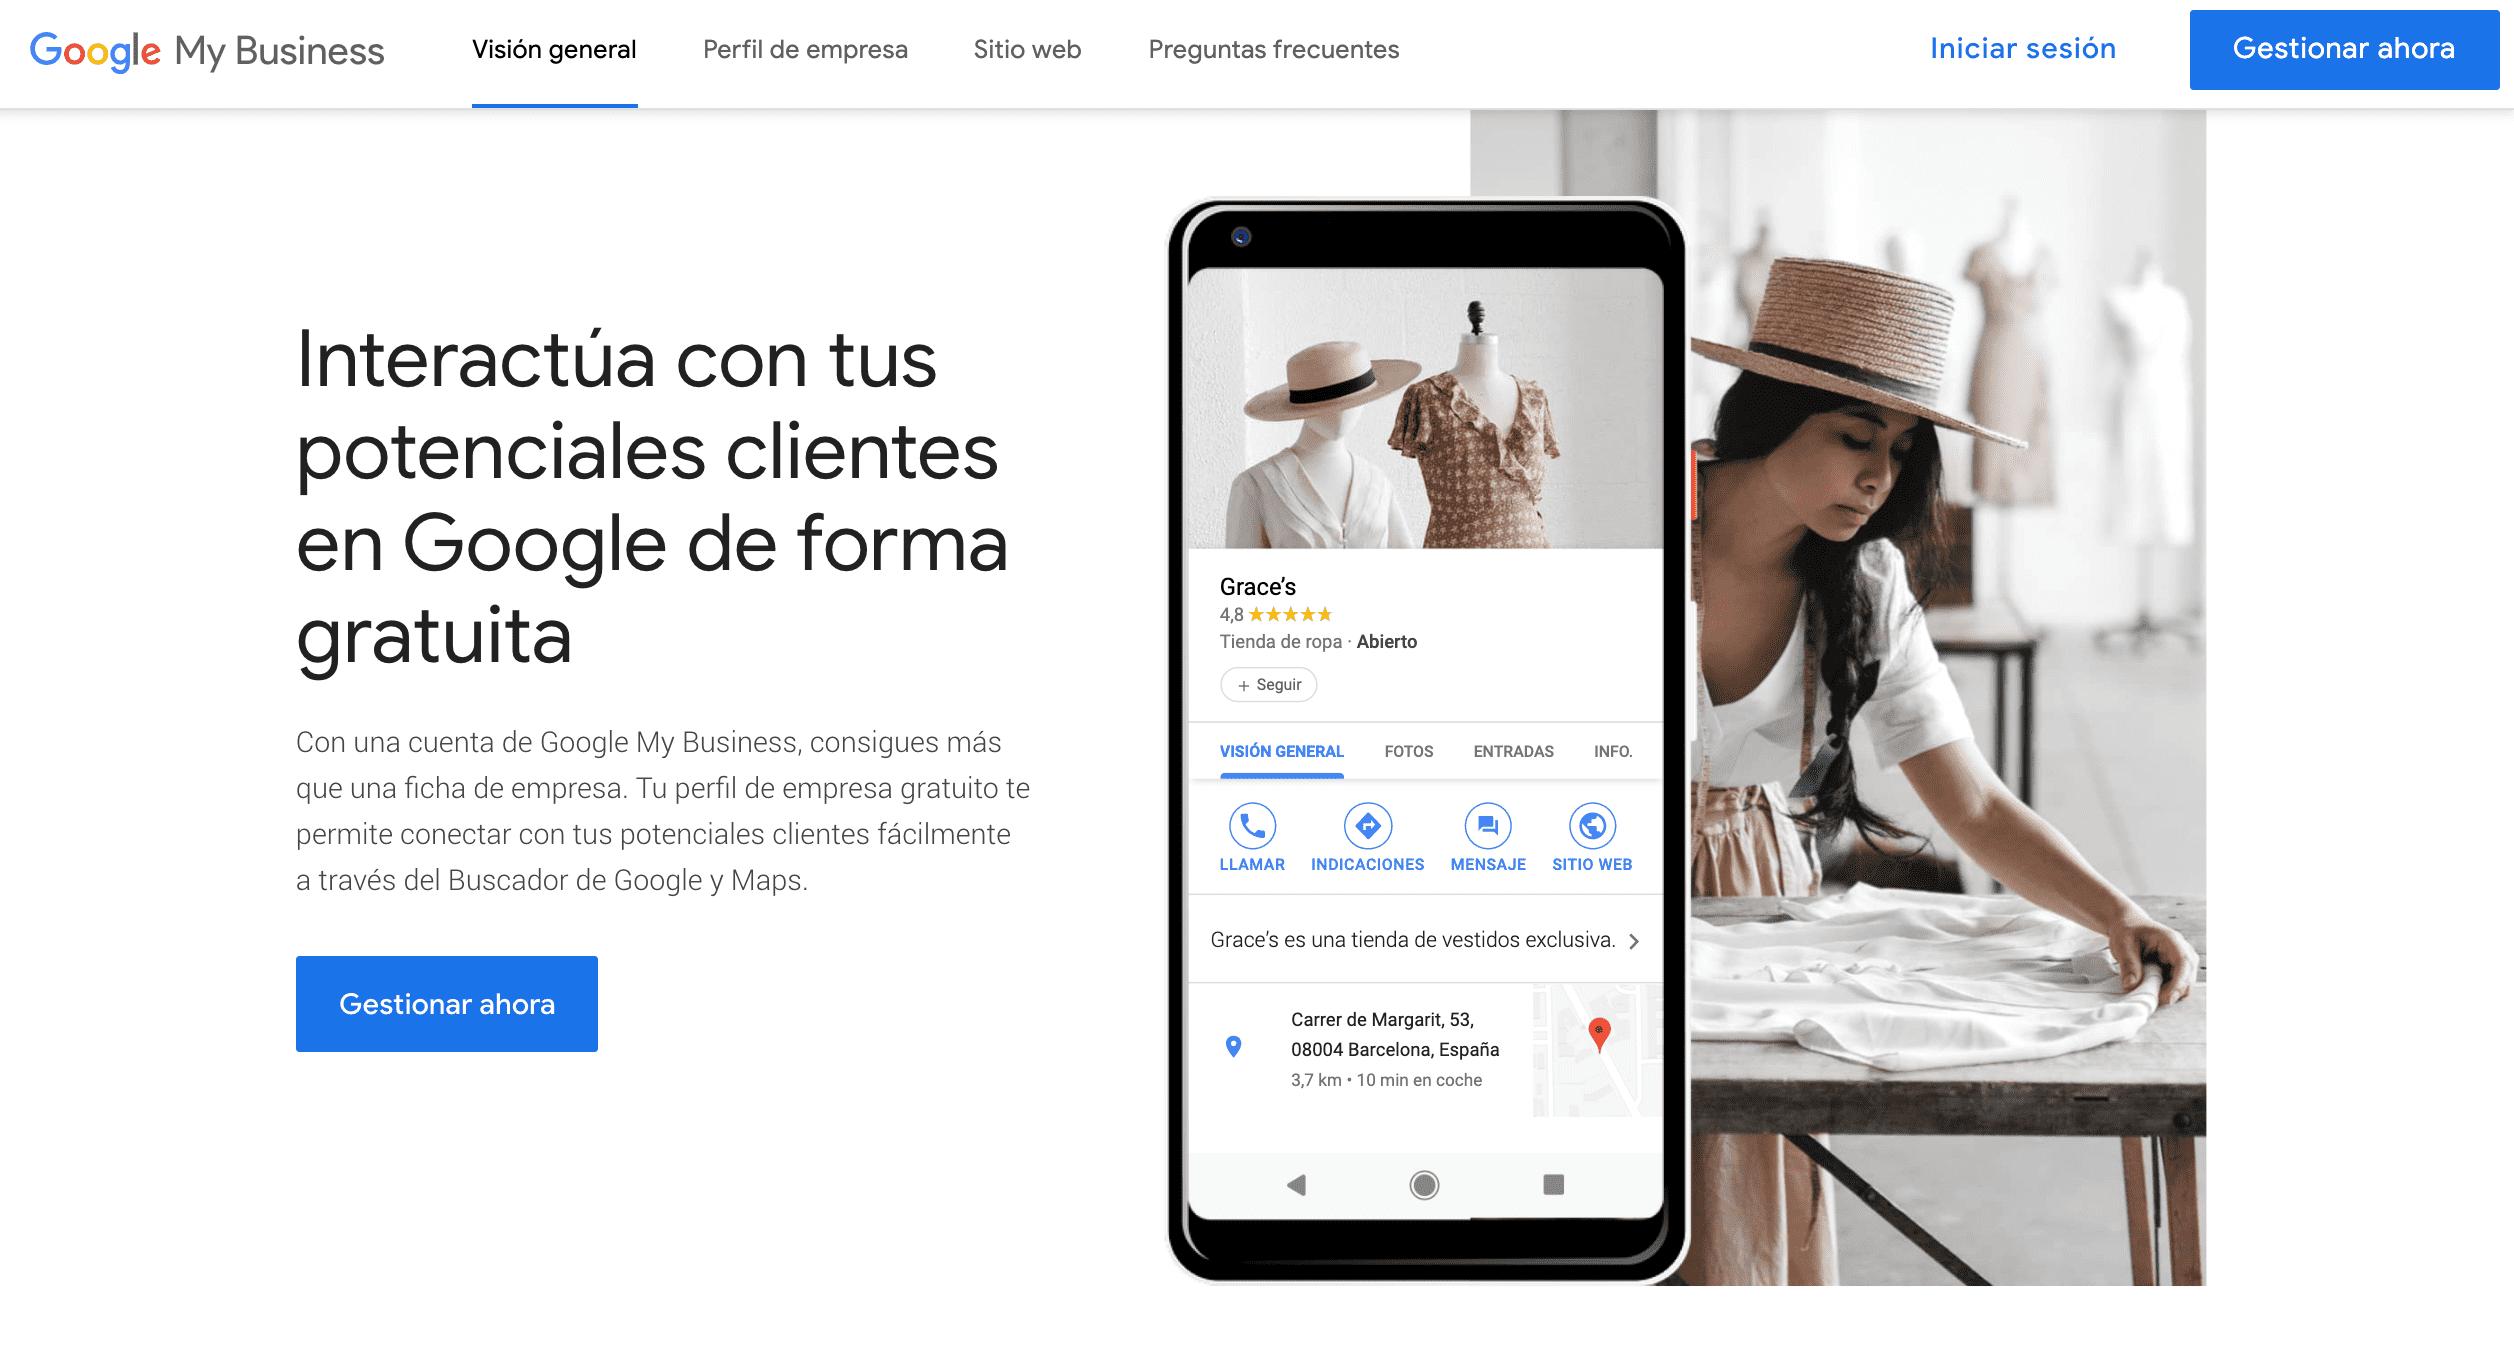 captura de imagen plataforma google my business